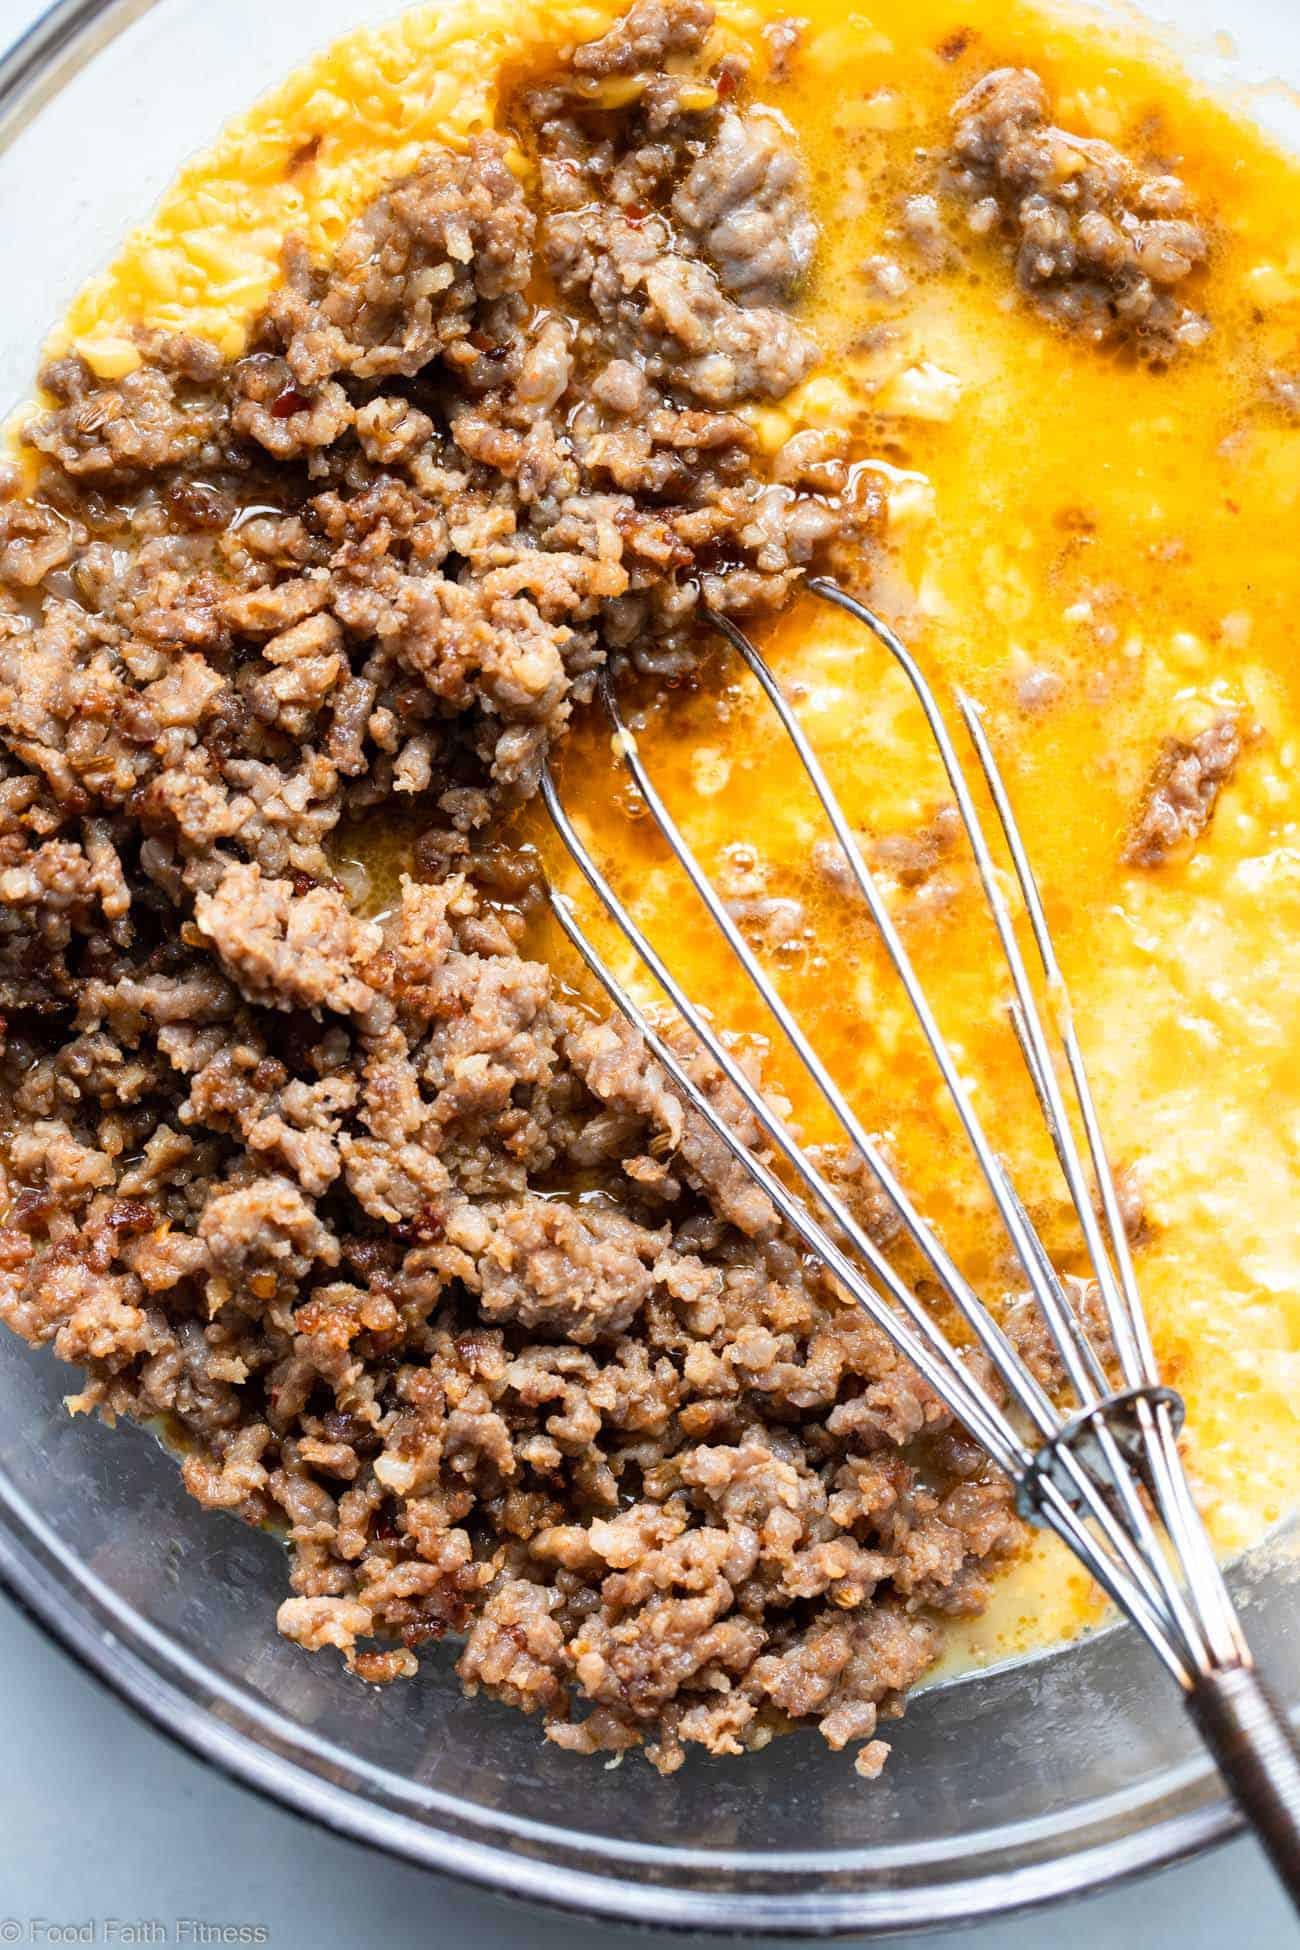 Instant Pot Brunch Recipes  Instant Pot Breakfast Casserole with Sausage